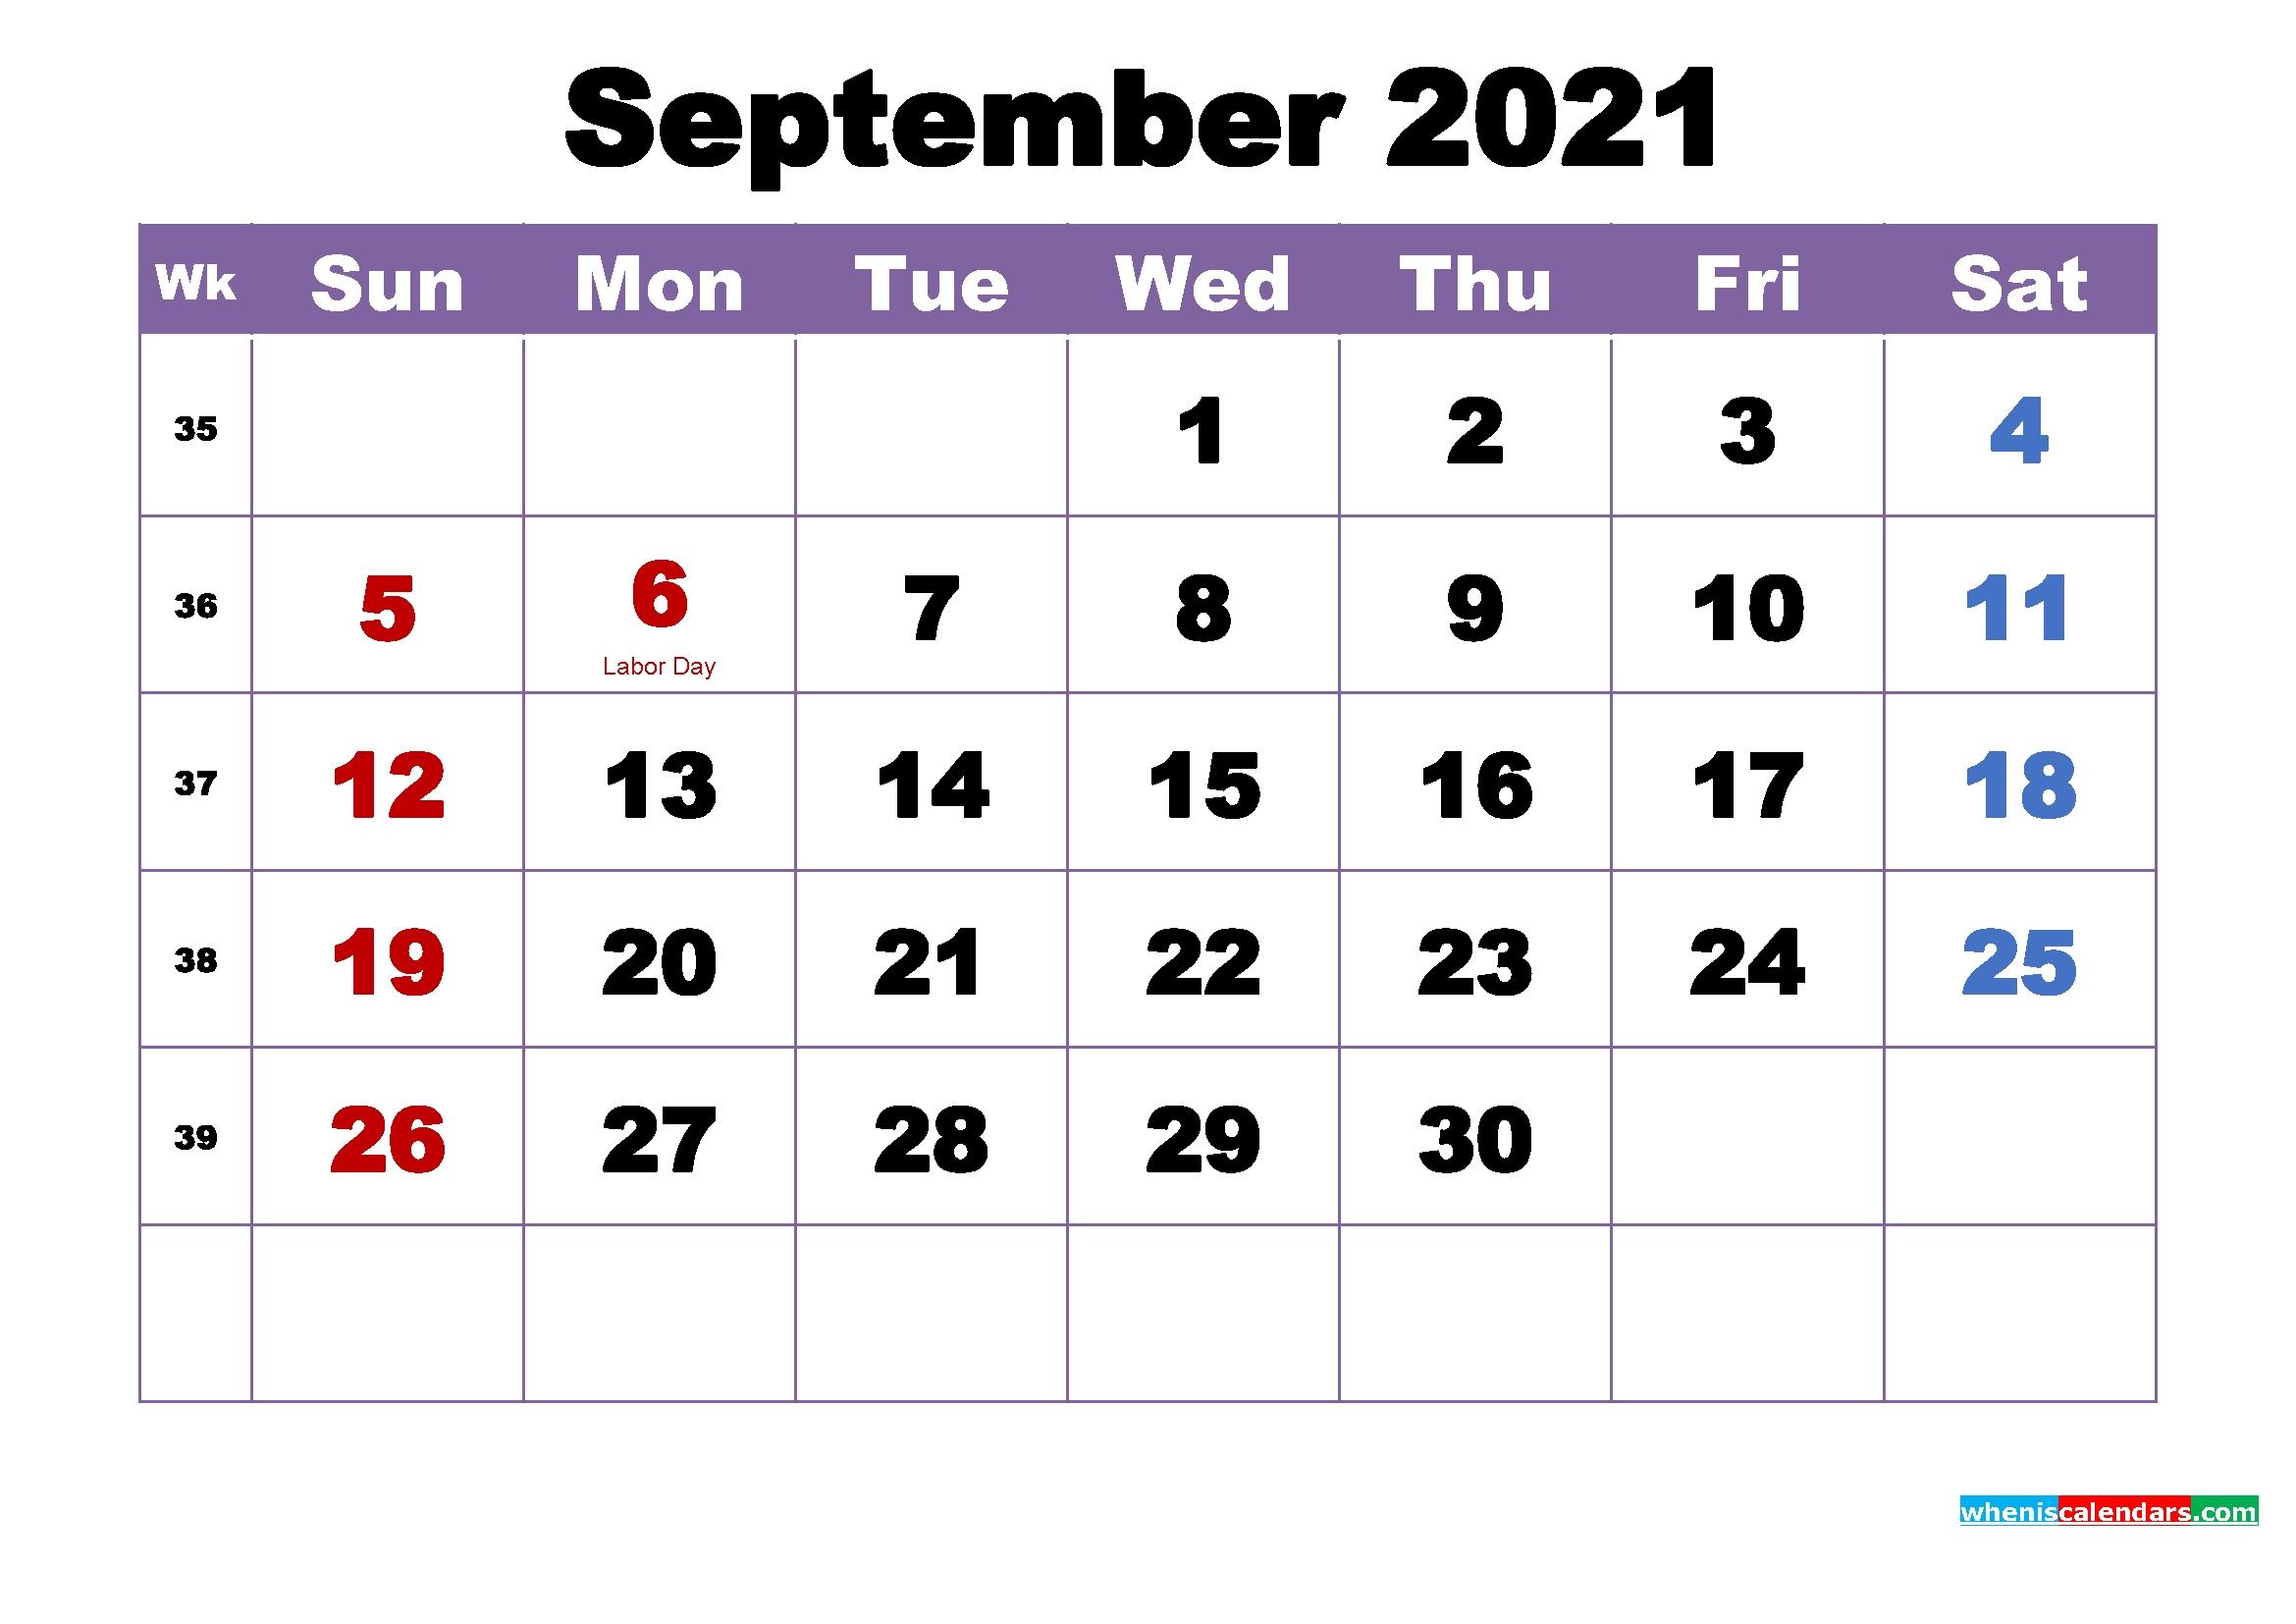 September 2021 Calendar With Holidays Printable September - December 2021 Calendar